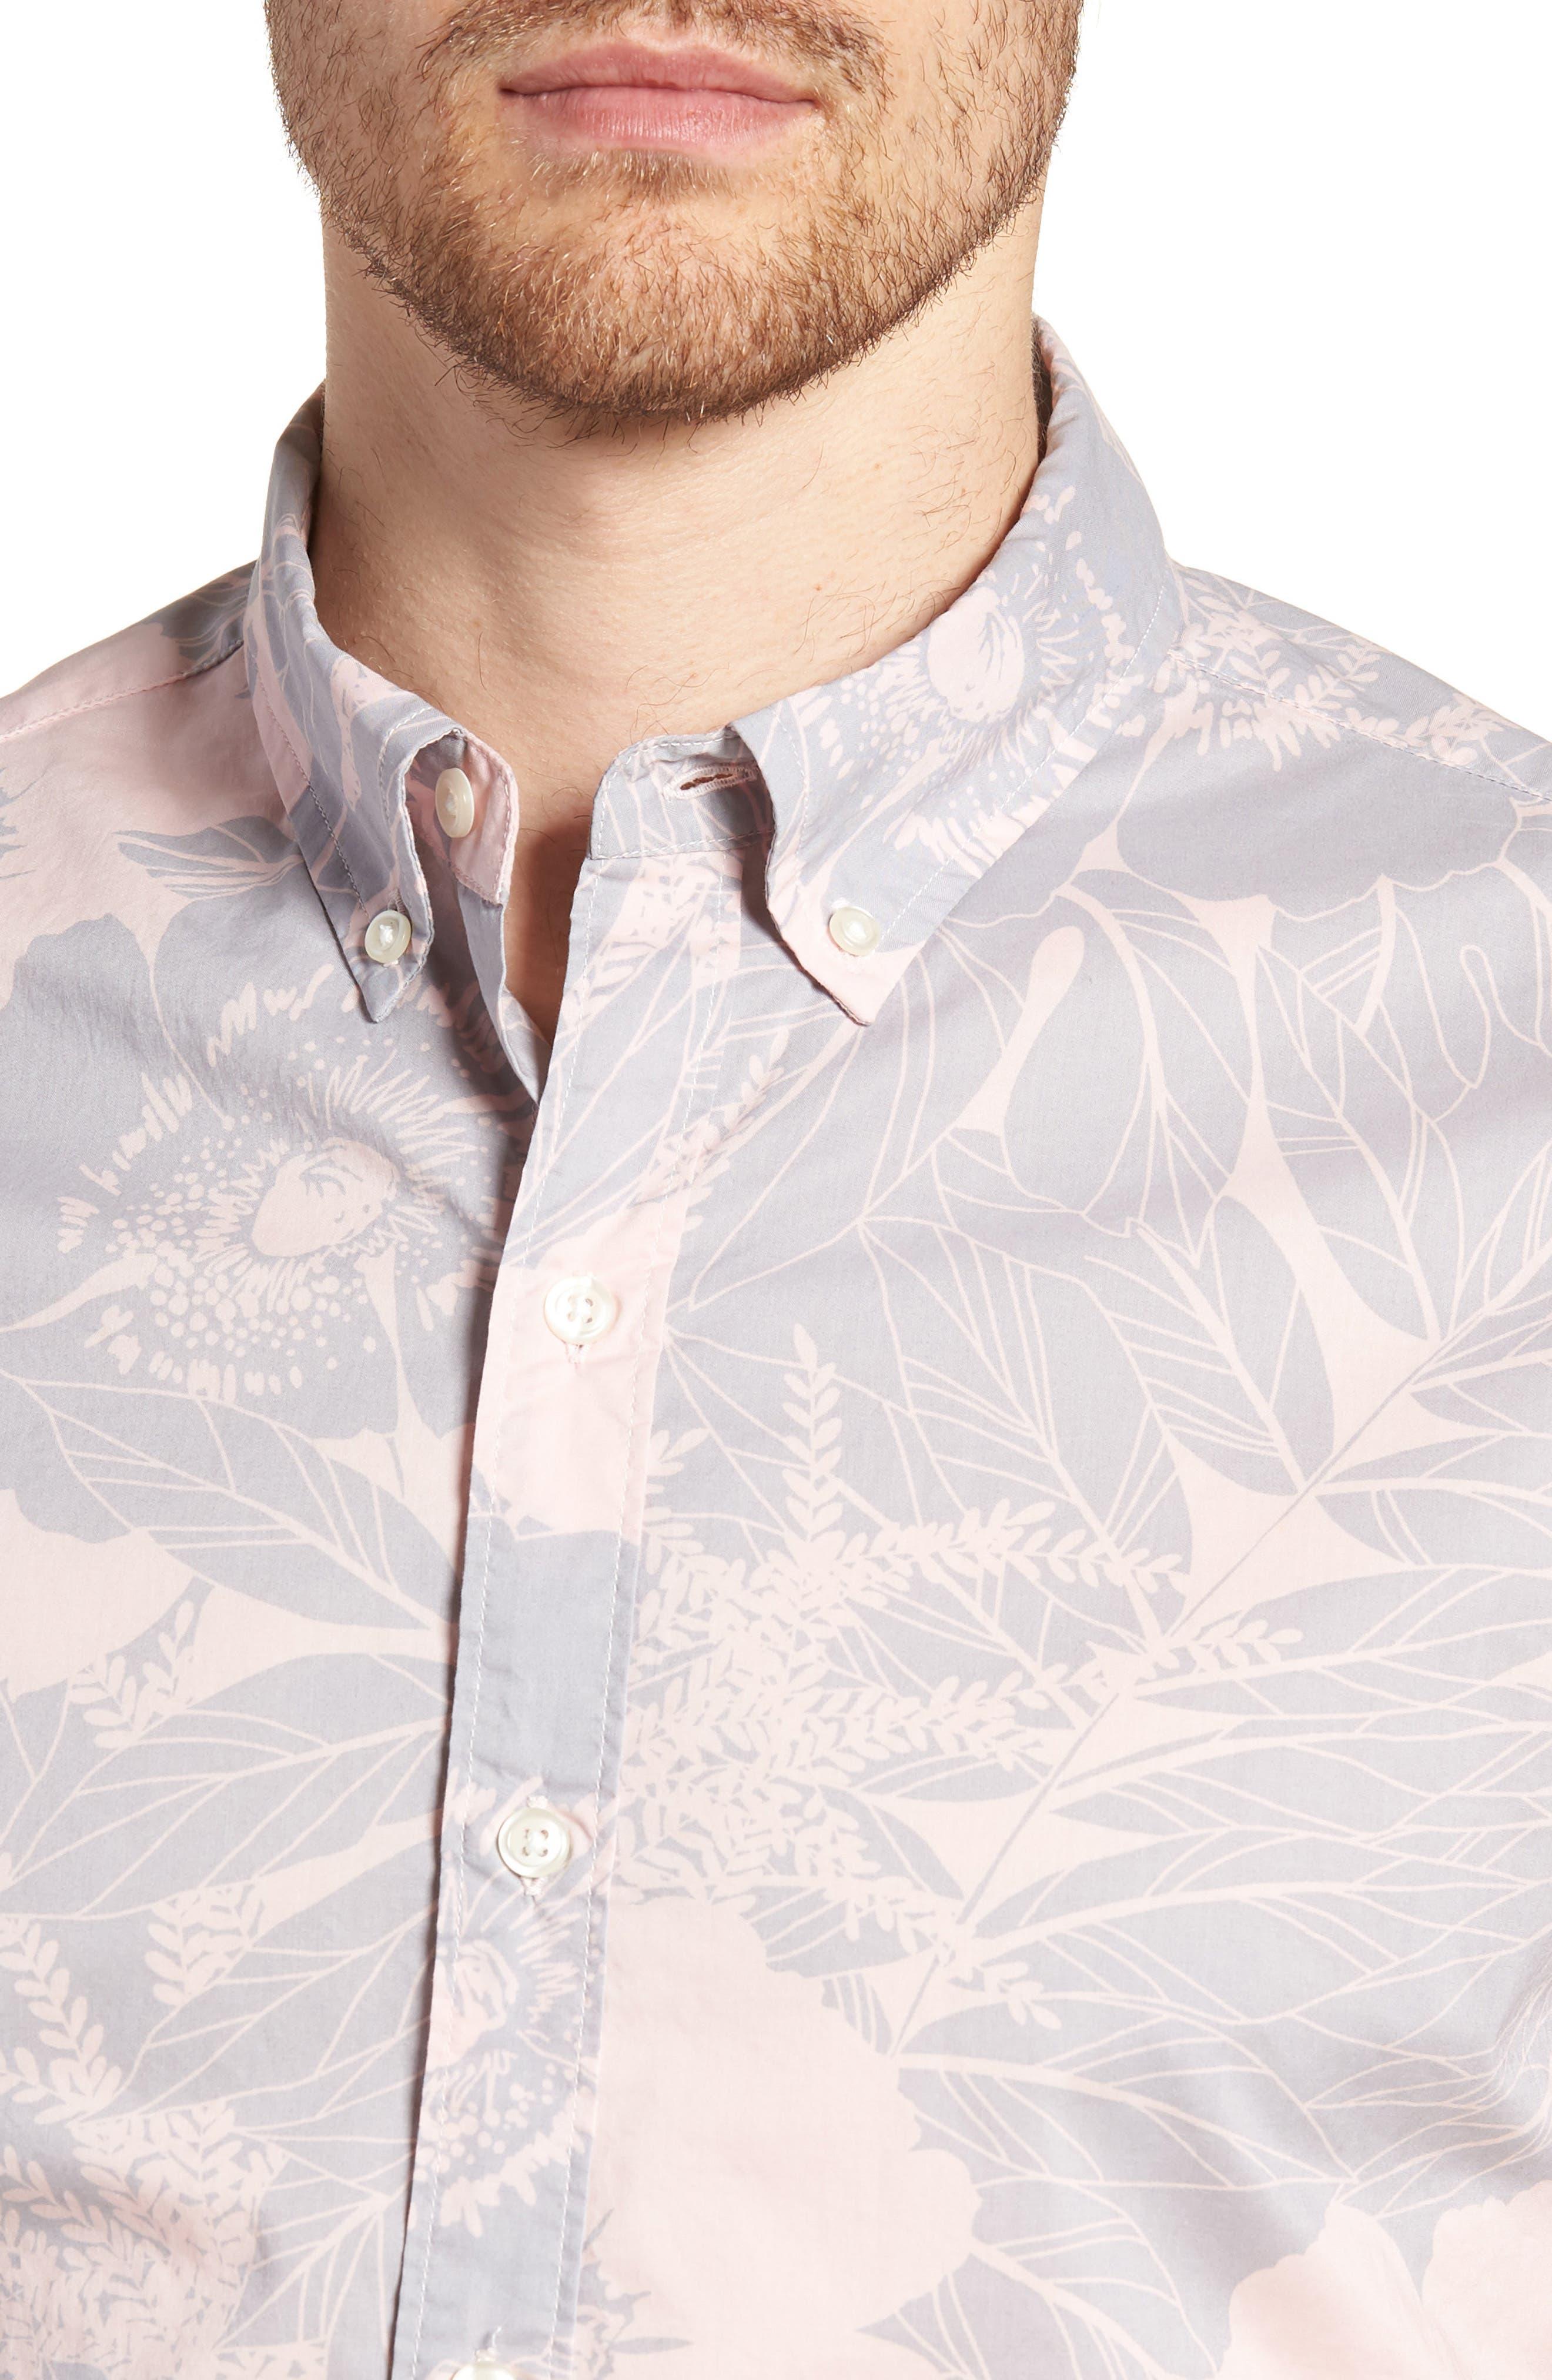 Riviera Slim Fit Floral Print Sport Shirt,                             Alternate thumbnail 4, color,                             LINEAR FLORAL - SKIVVY PINK